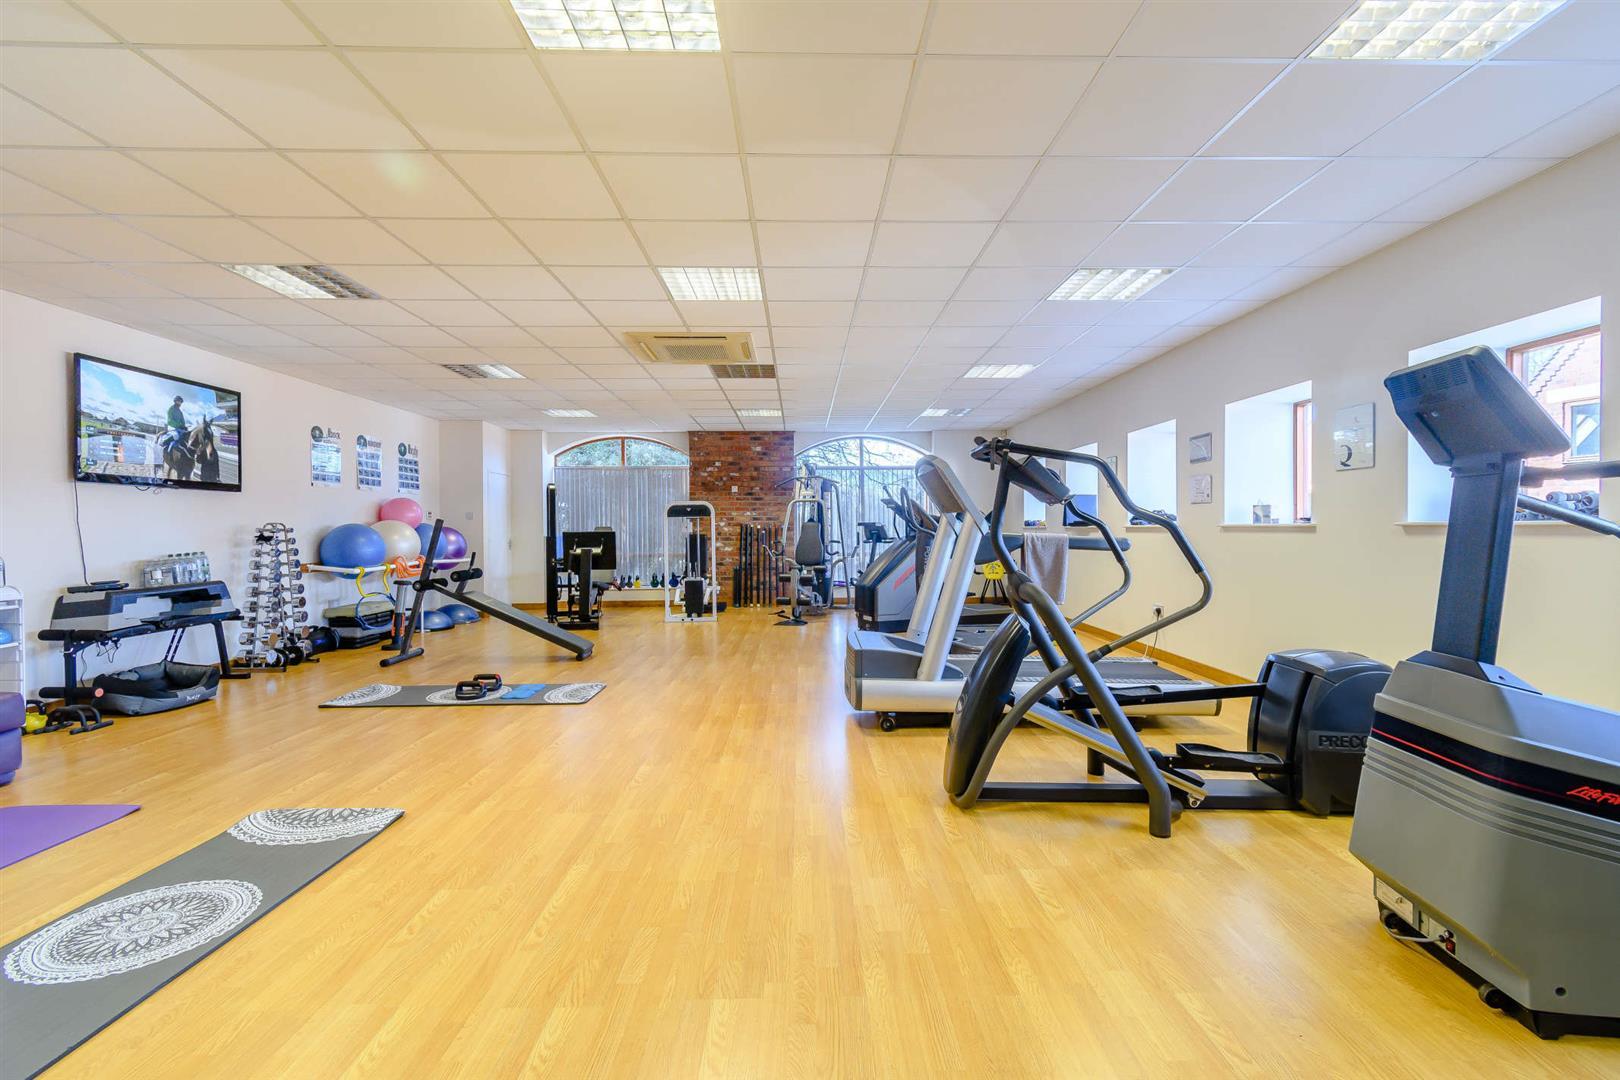 Henley In Arden, Warwickshire, 6 Bedrooms, Home Gym